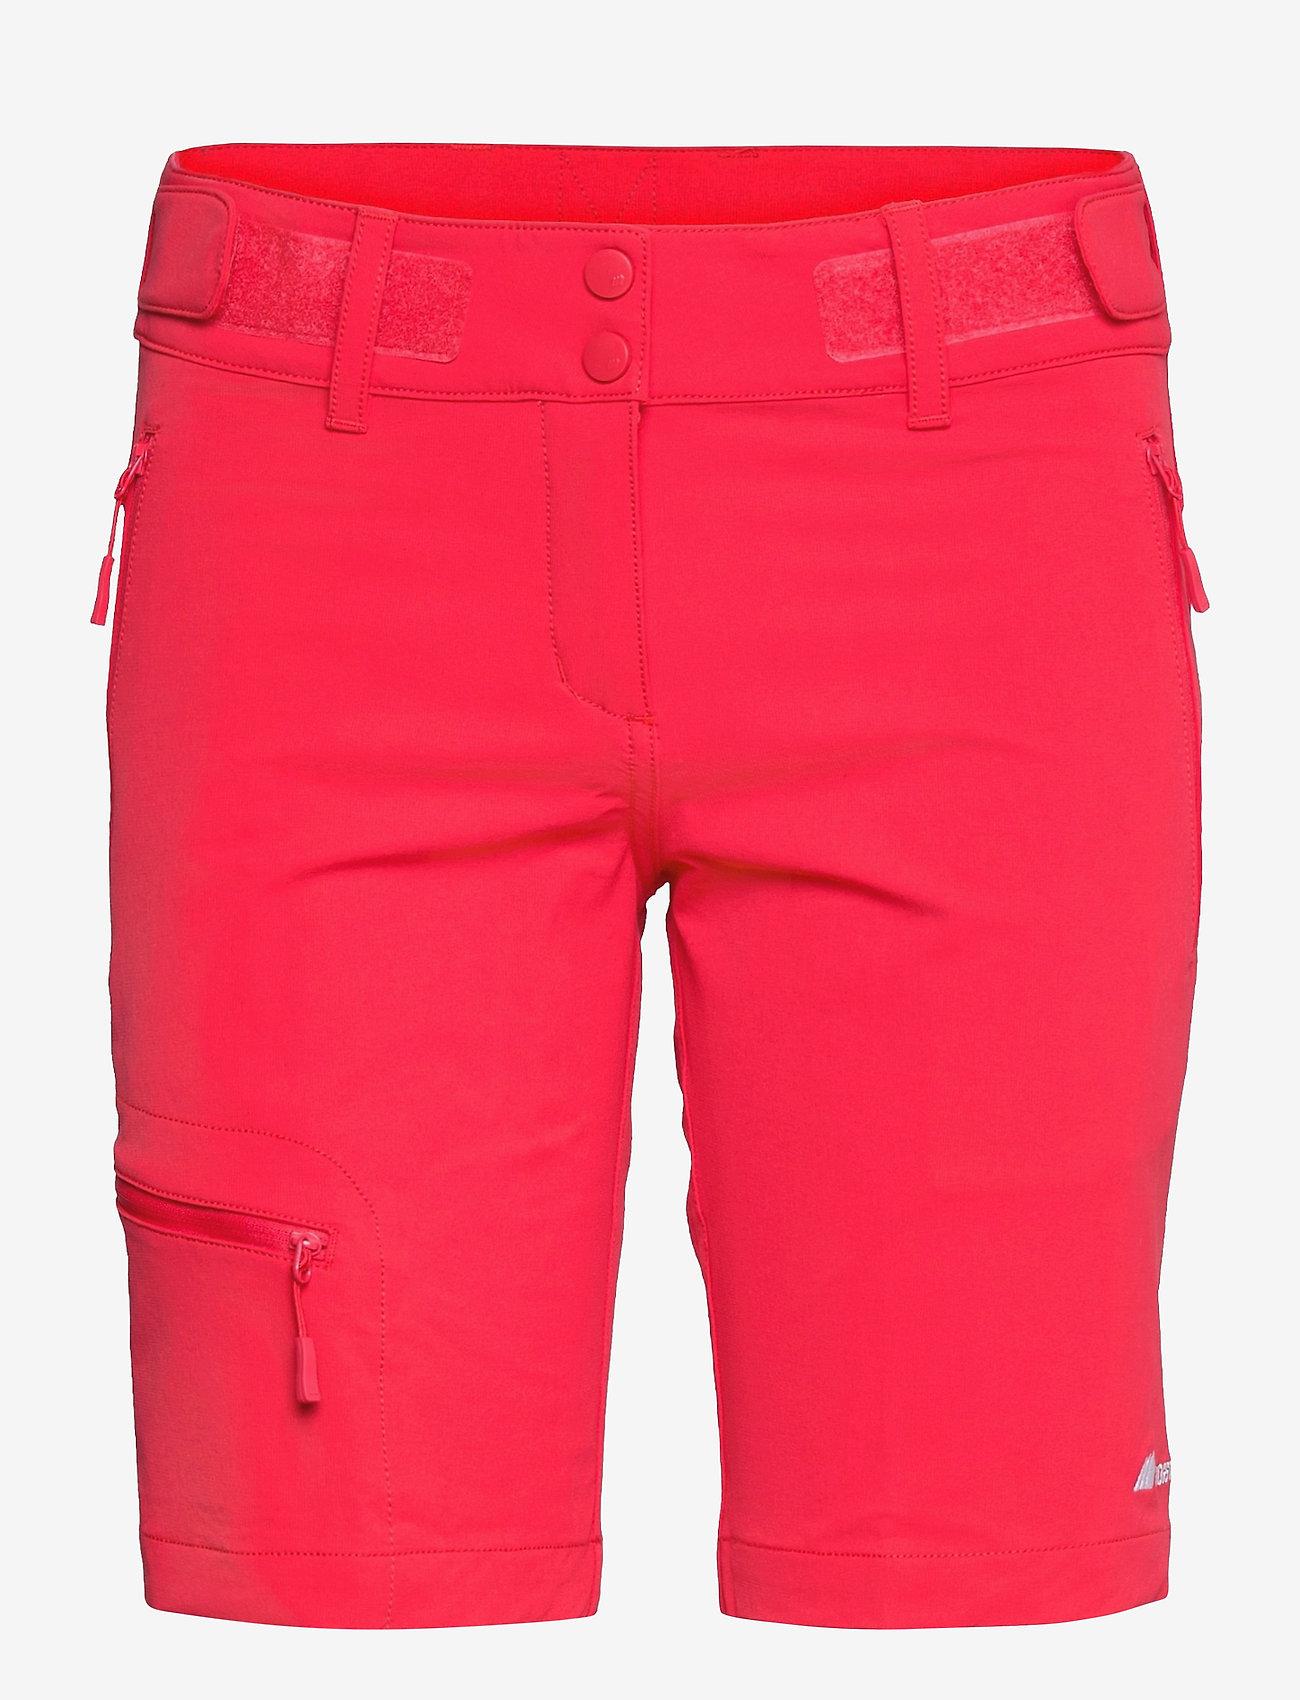 Skogstad - Veotinden   Shorts - chaussures de course - hibiscus red - 0